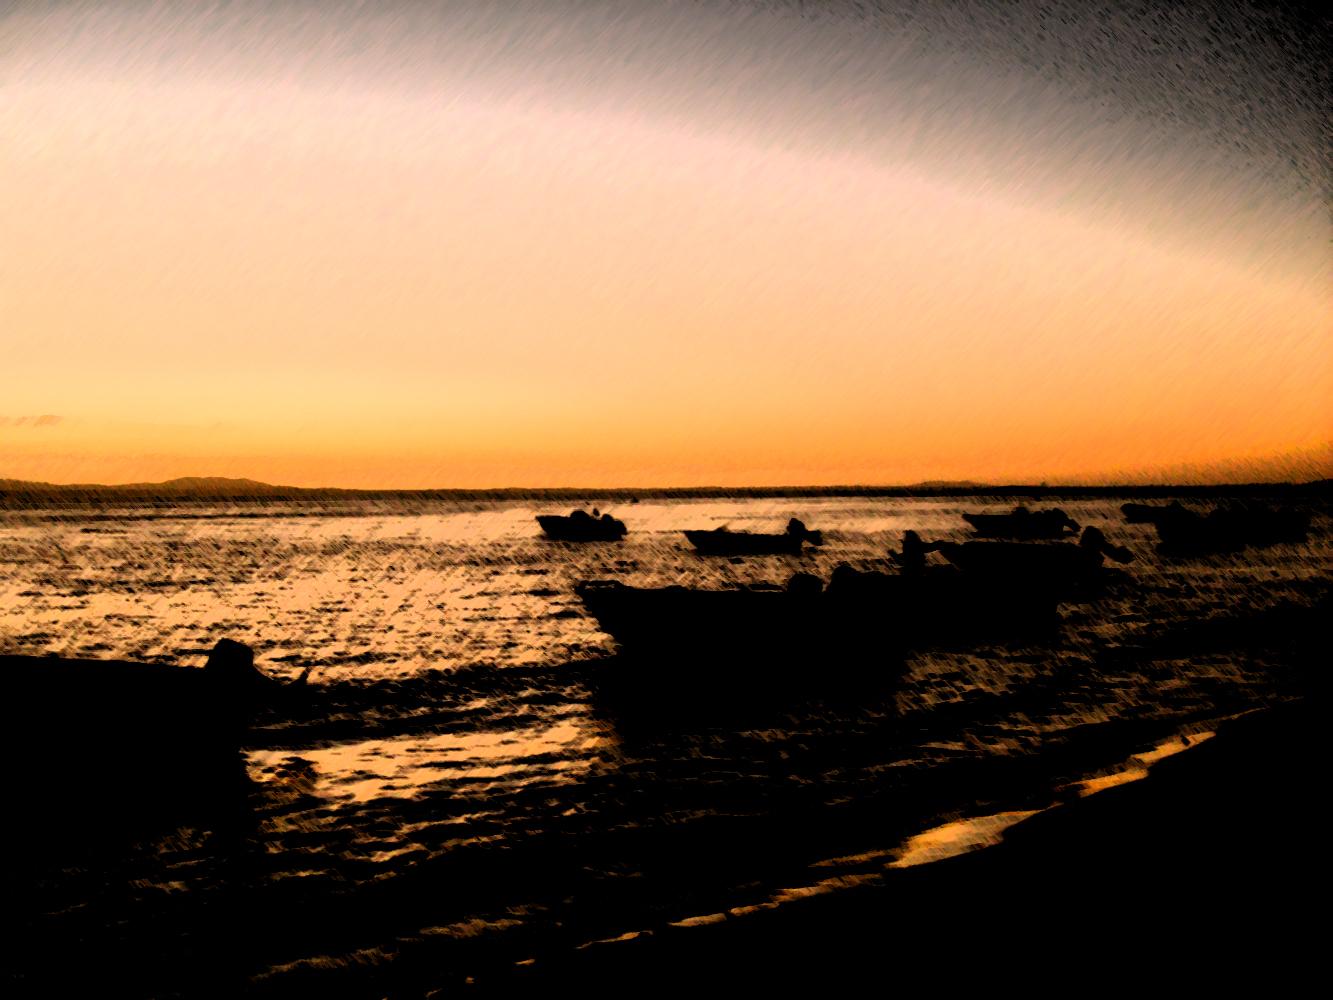 Boat Art, Art, Beach, Boats, Dusk, HQ Photo